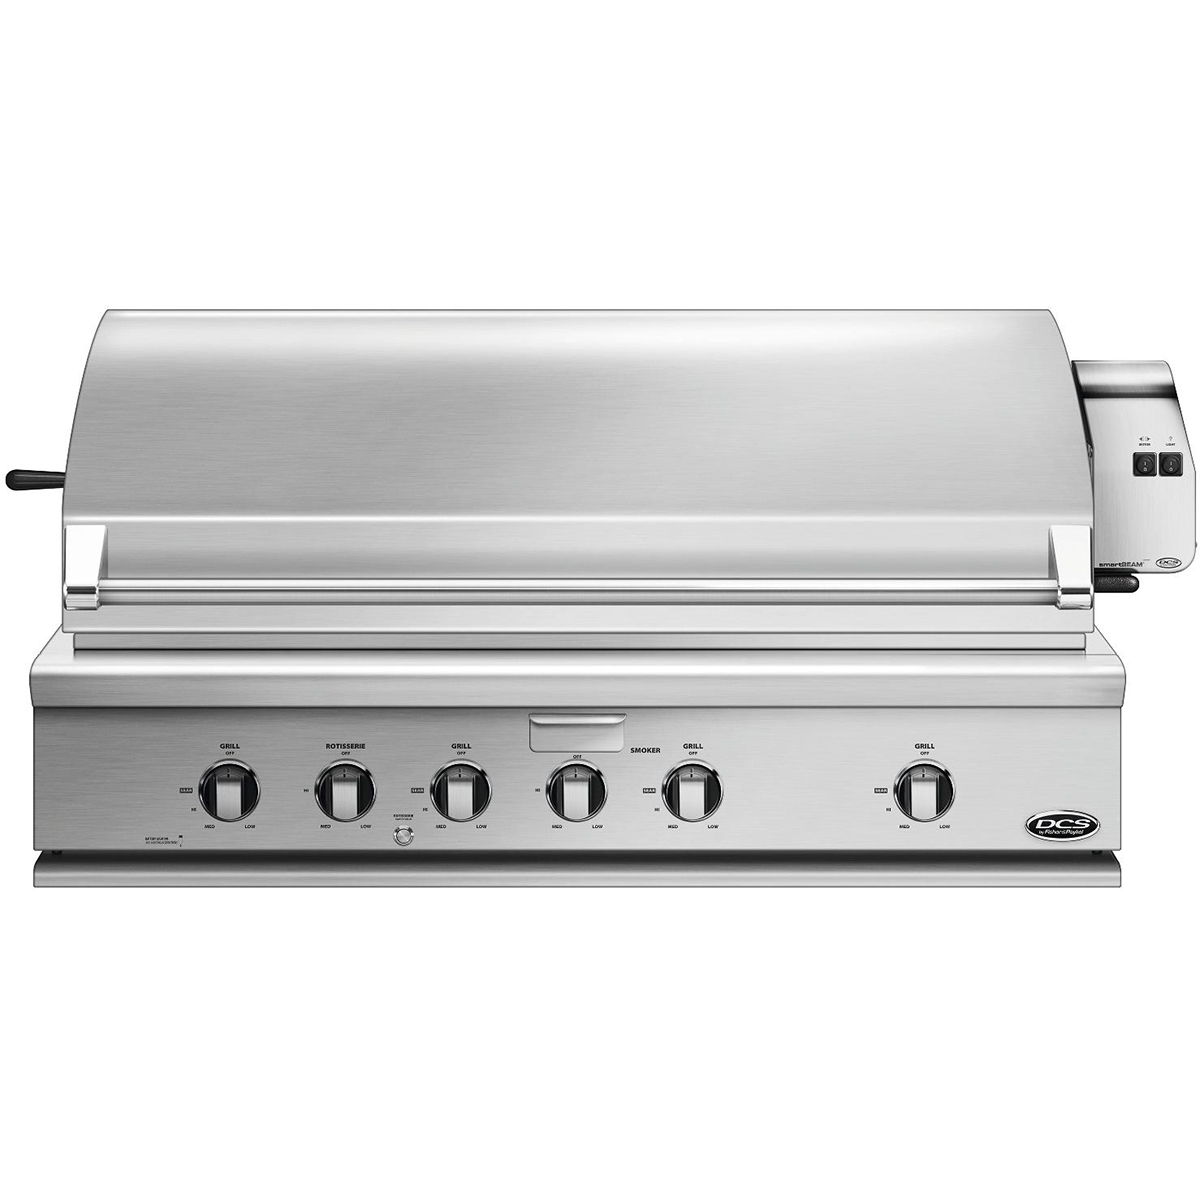 DCS 48 inch Built-in Gas Grill - Liquid Propane - BGC48-BQAR-L